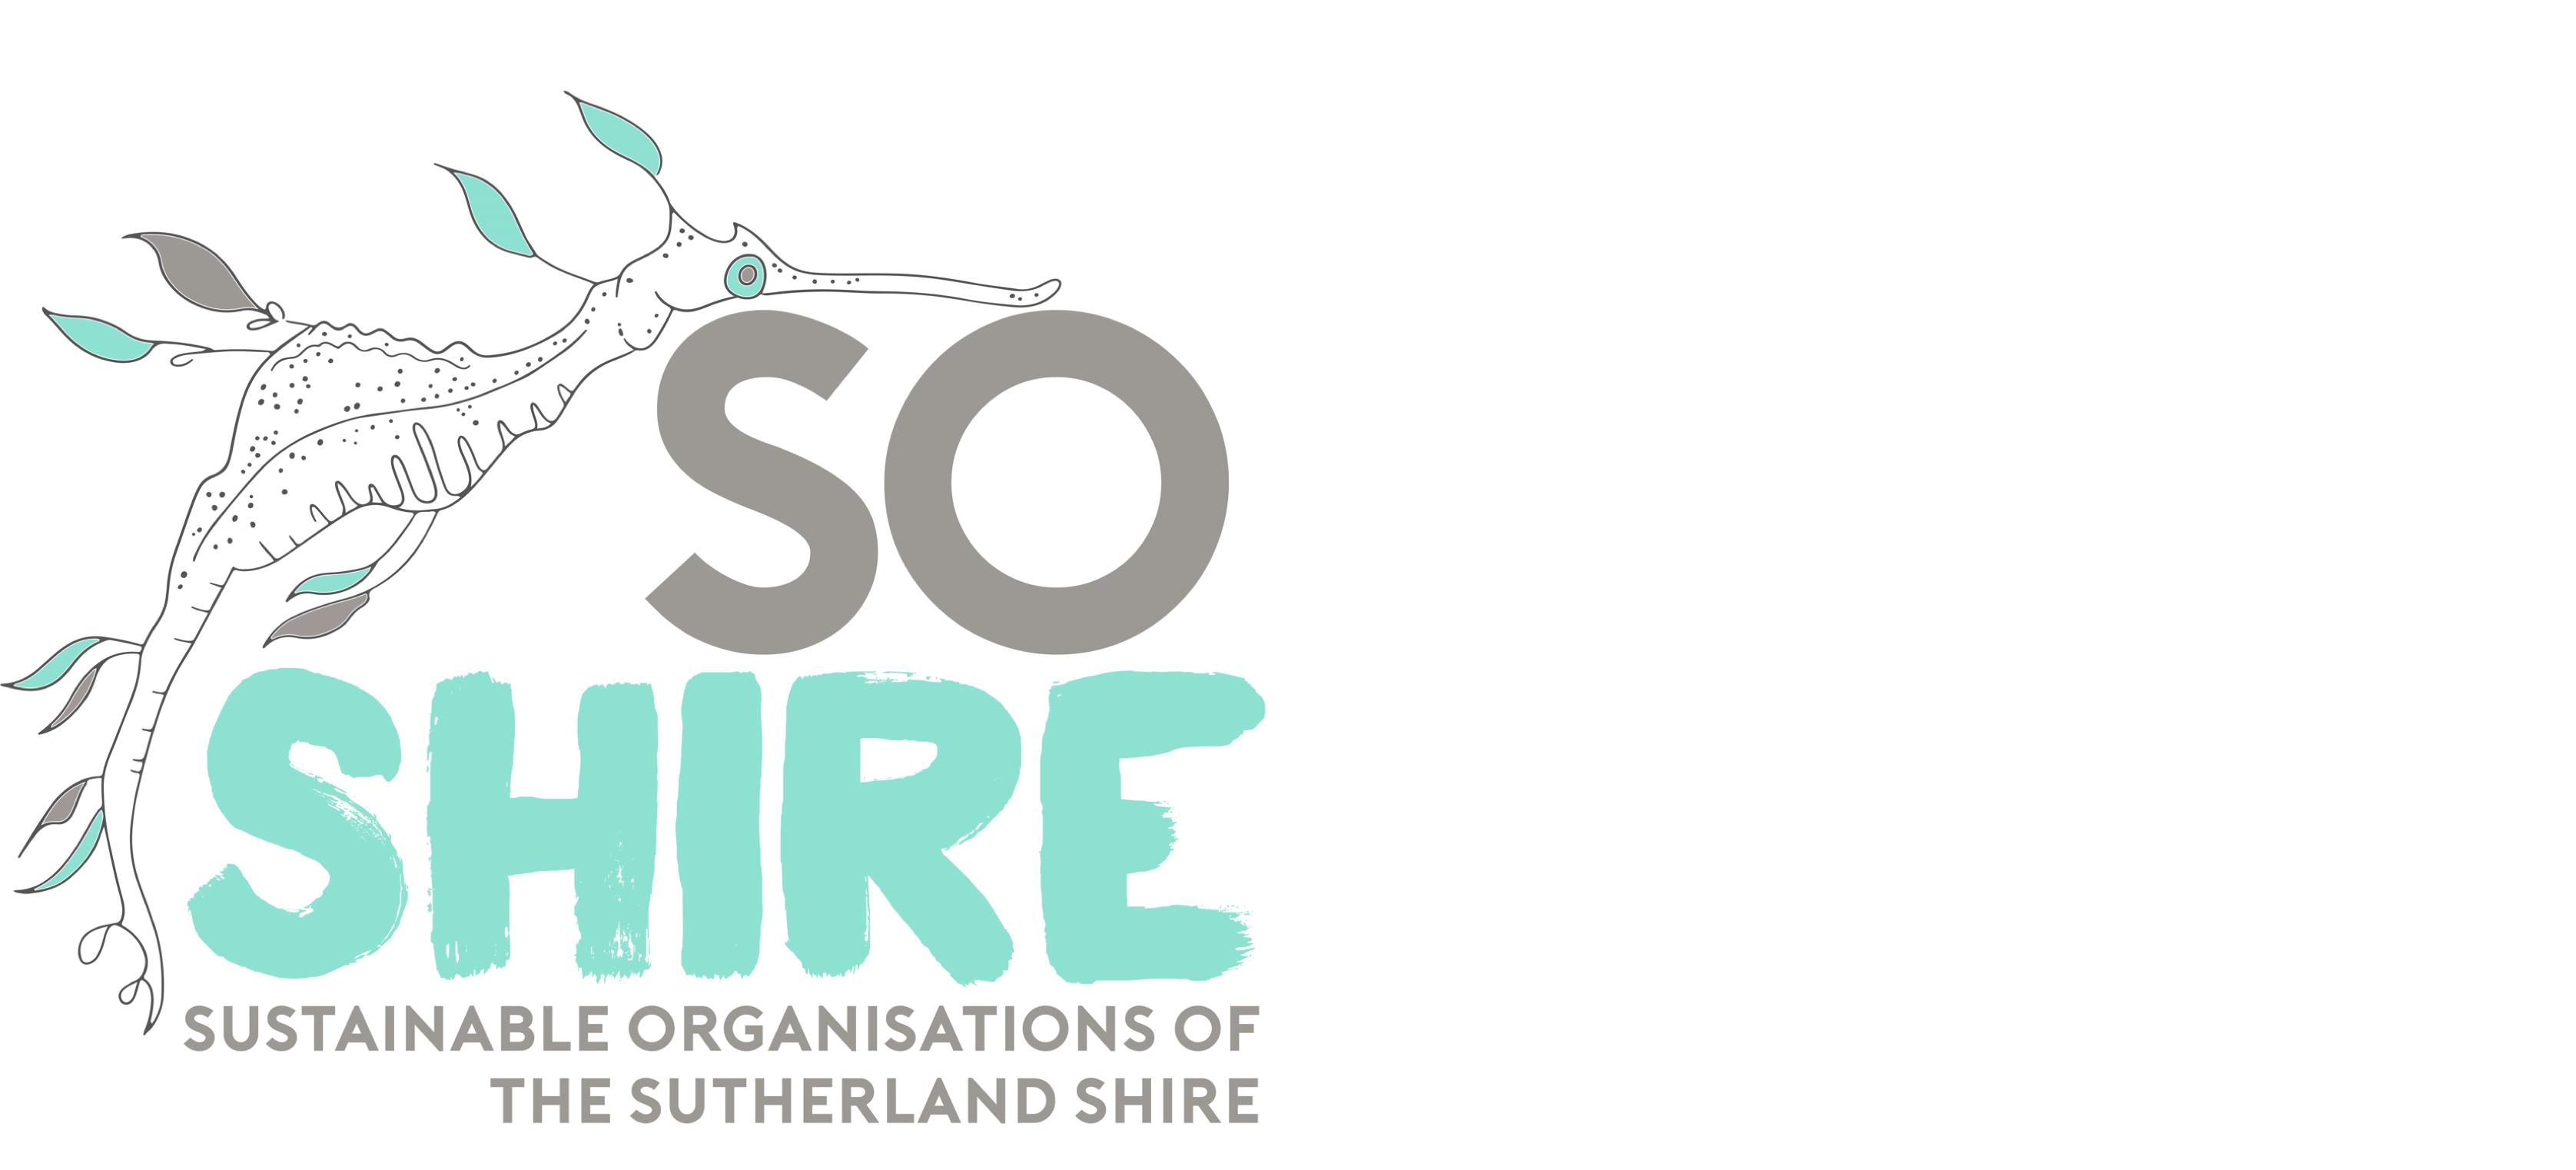 SO Shire & Plastic Free Sutherland Shire